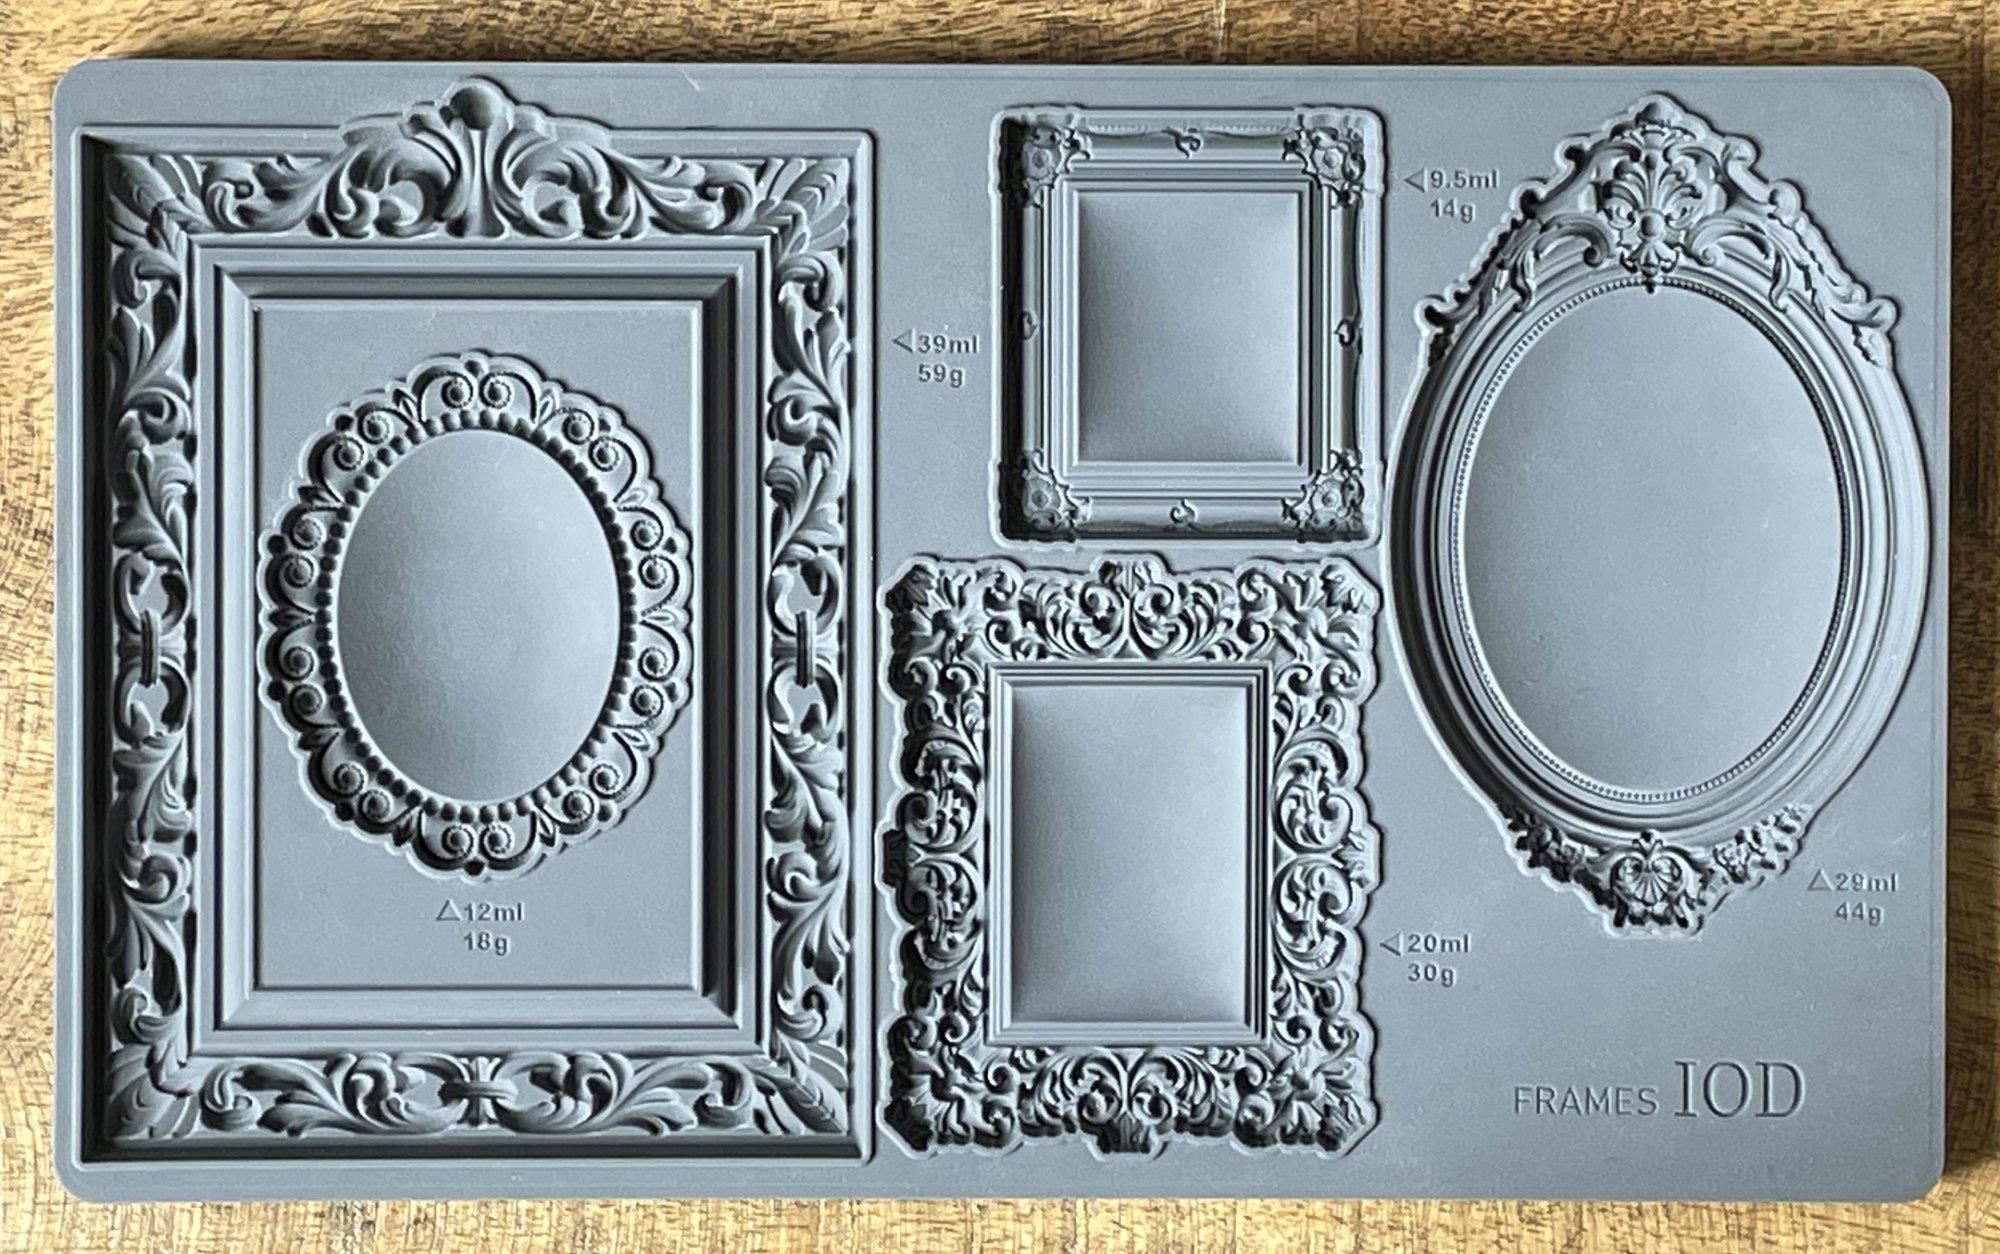 Frames 6x10 IOD Mould